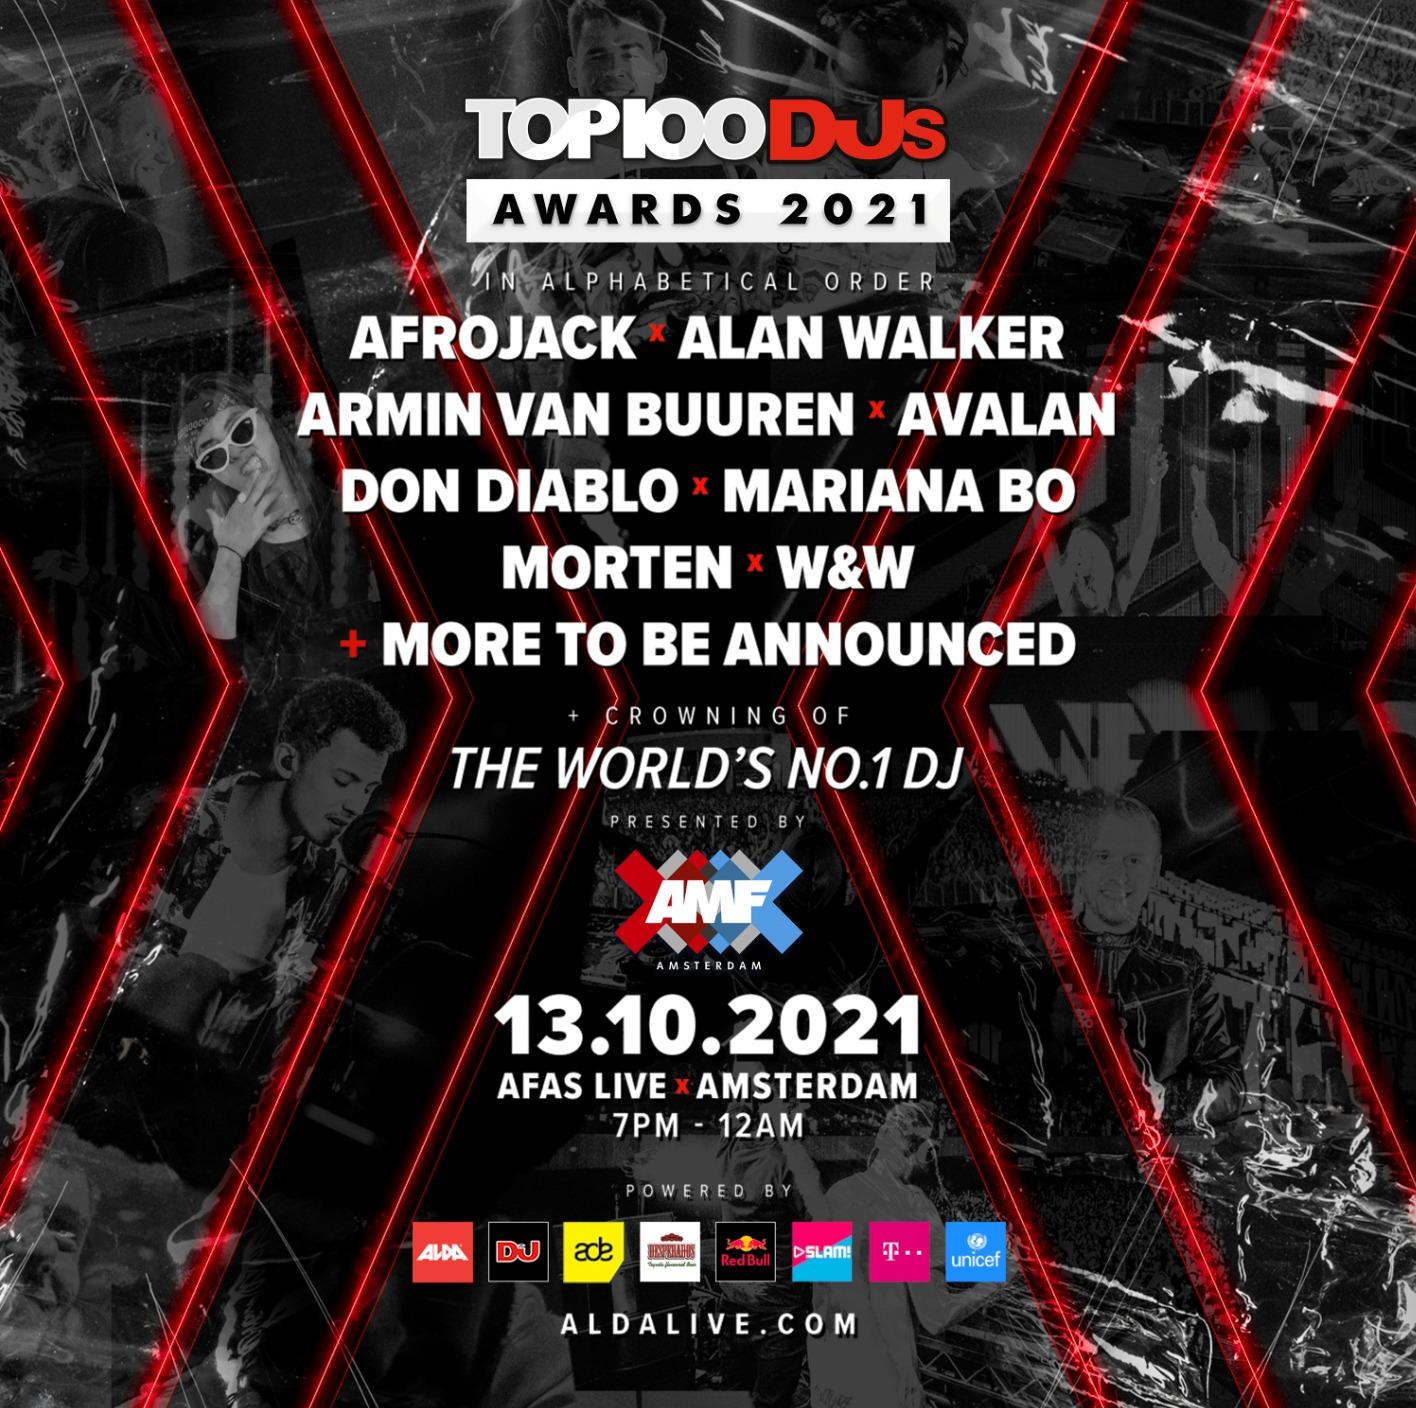 New Top 100 DJs Awards Show Announced for ADE 2021